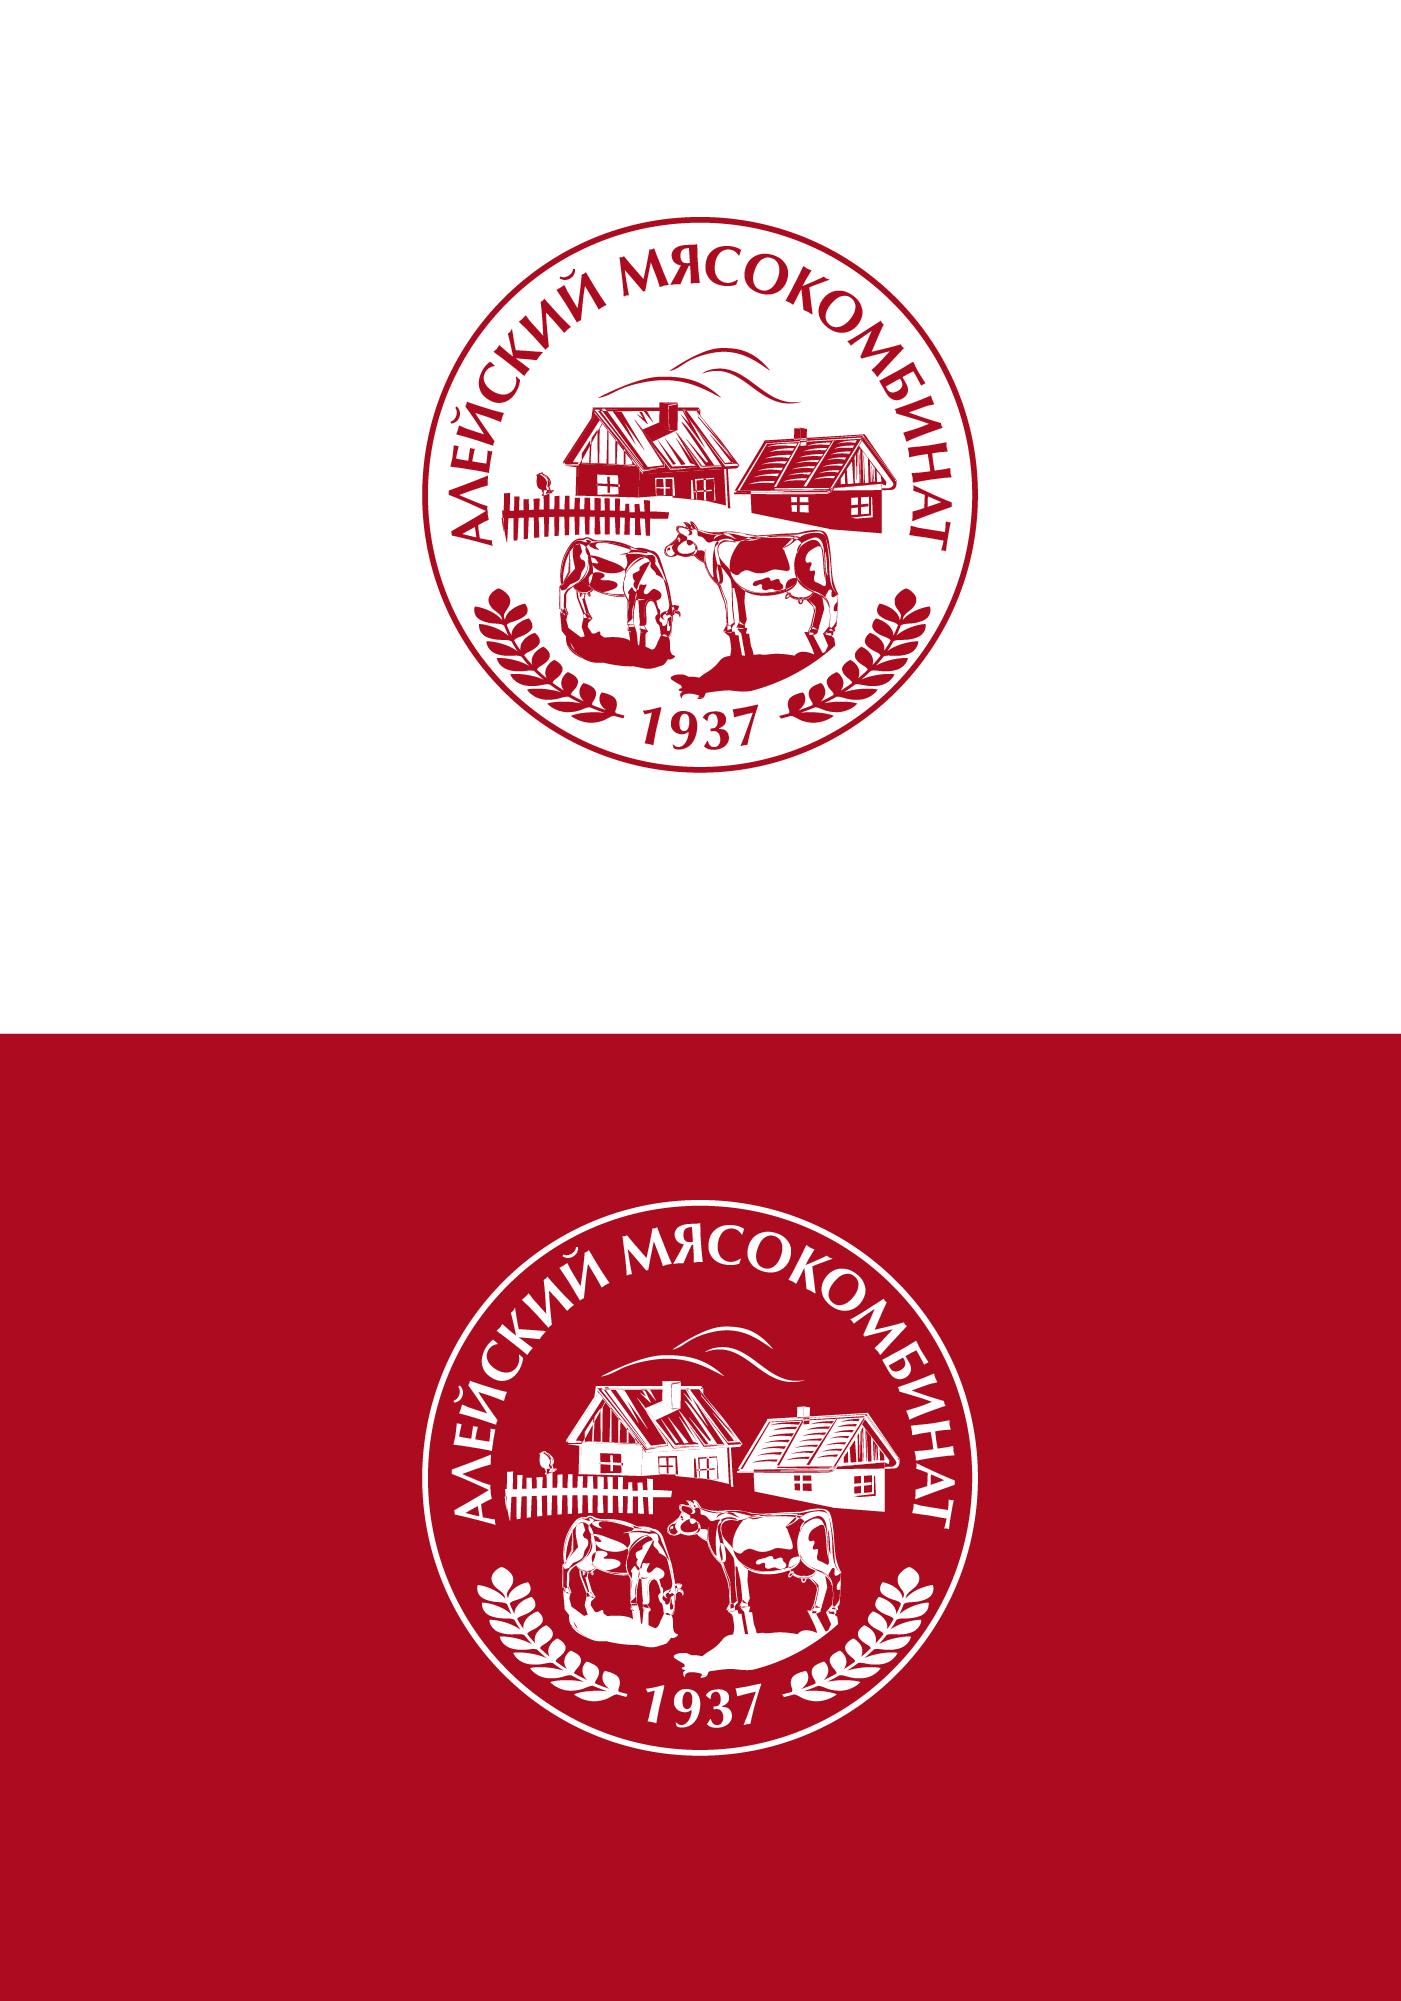 "Разработака логотипа для ООО ""Алейский мясокомбинат"" фото f_0315b2162c58d573.jpg"